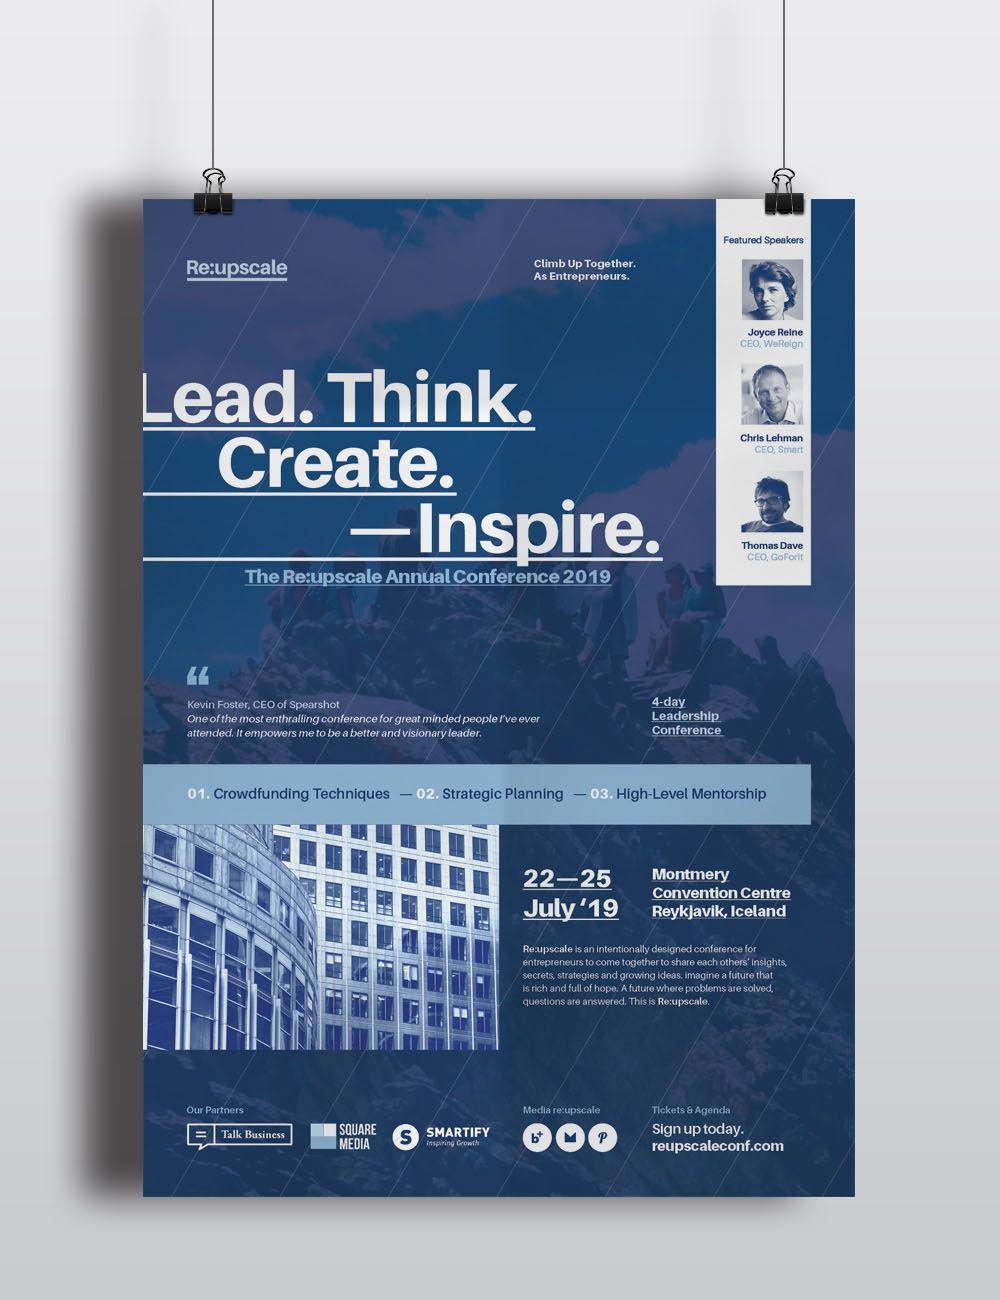 A Set Of 4 Event Conference Seminar Forum Symposium Workshop Flyer Poster Templates For Companies To Promote Mark Desain Web Desain Produk Desain Poster